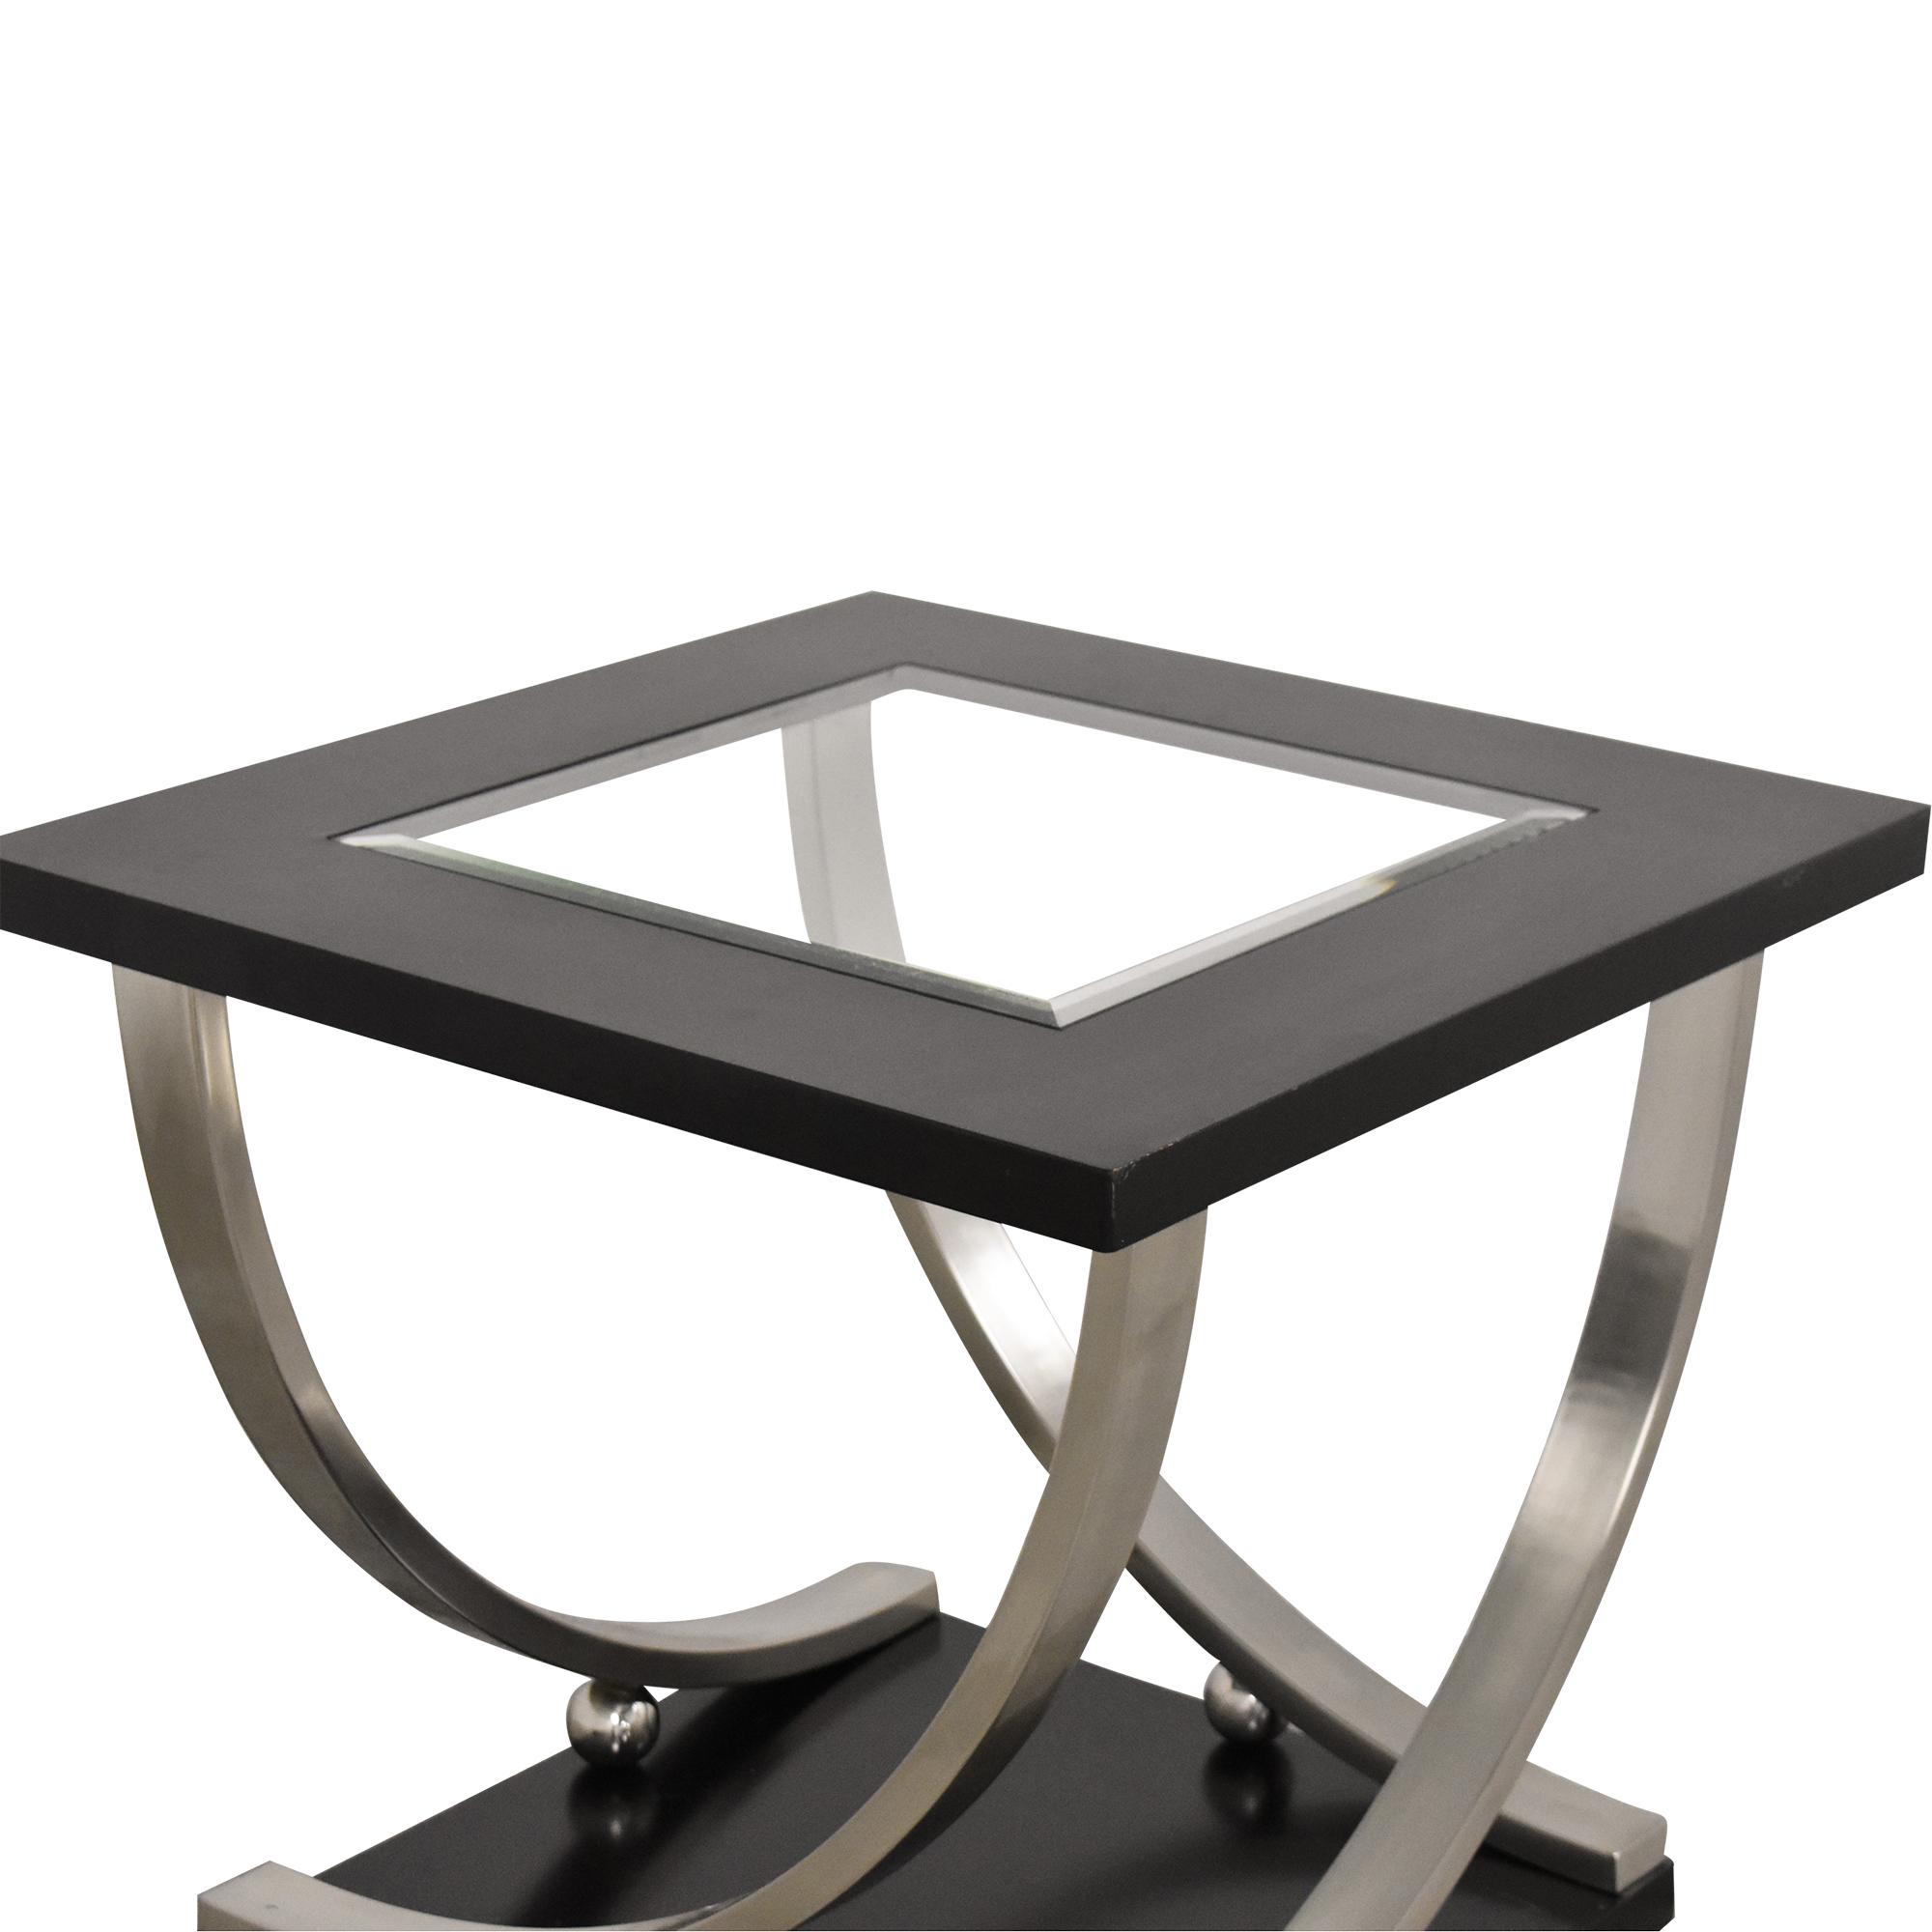 Raymour & Flanigan Ponti End Table sale